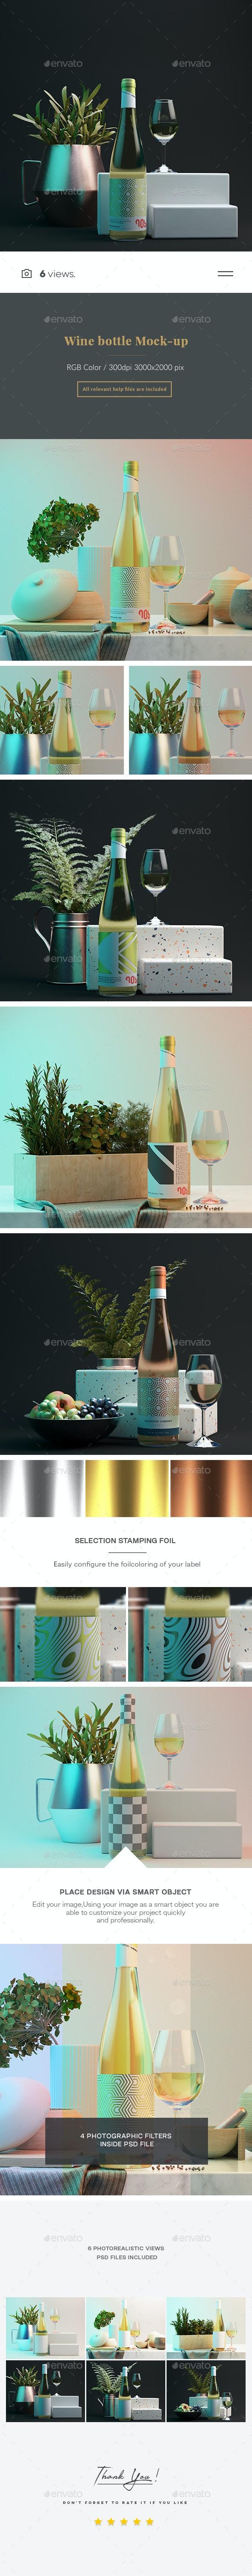 Wine bottle Mock-up 5 - Product Mock-Ups Graphics